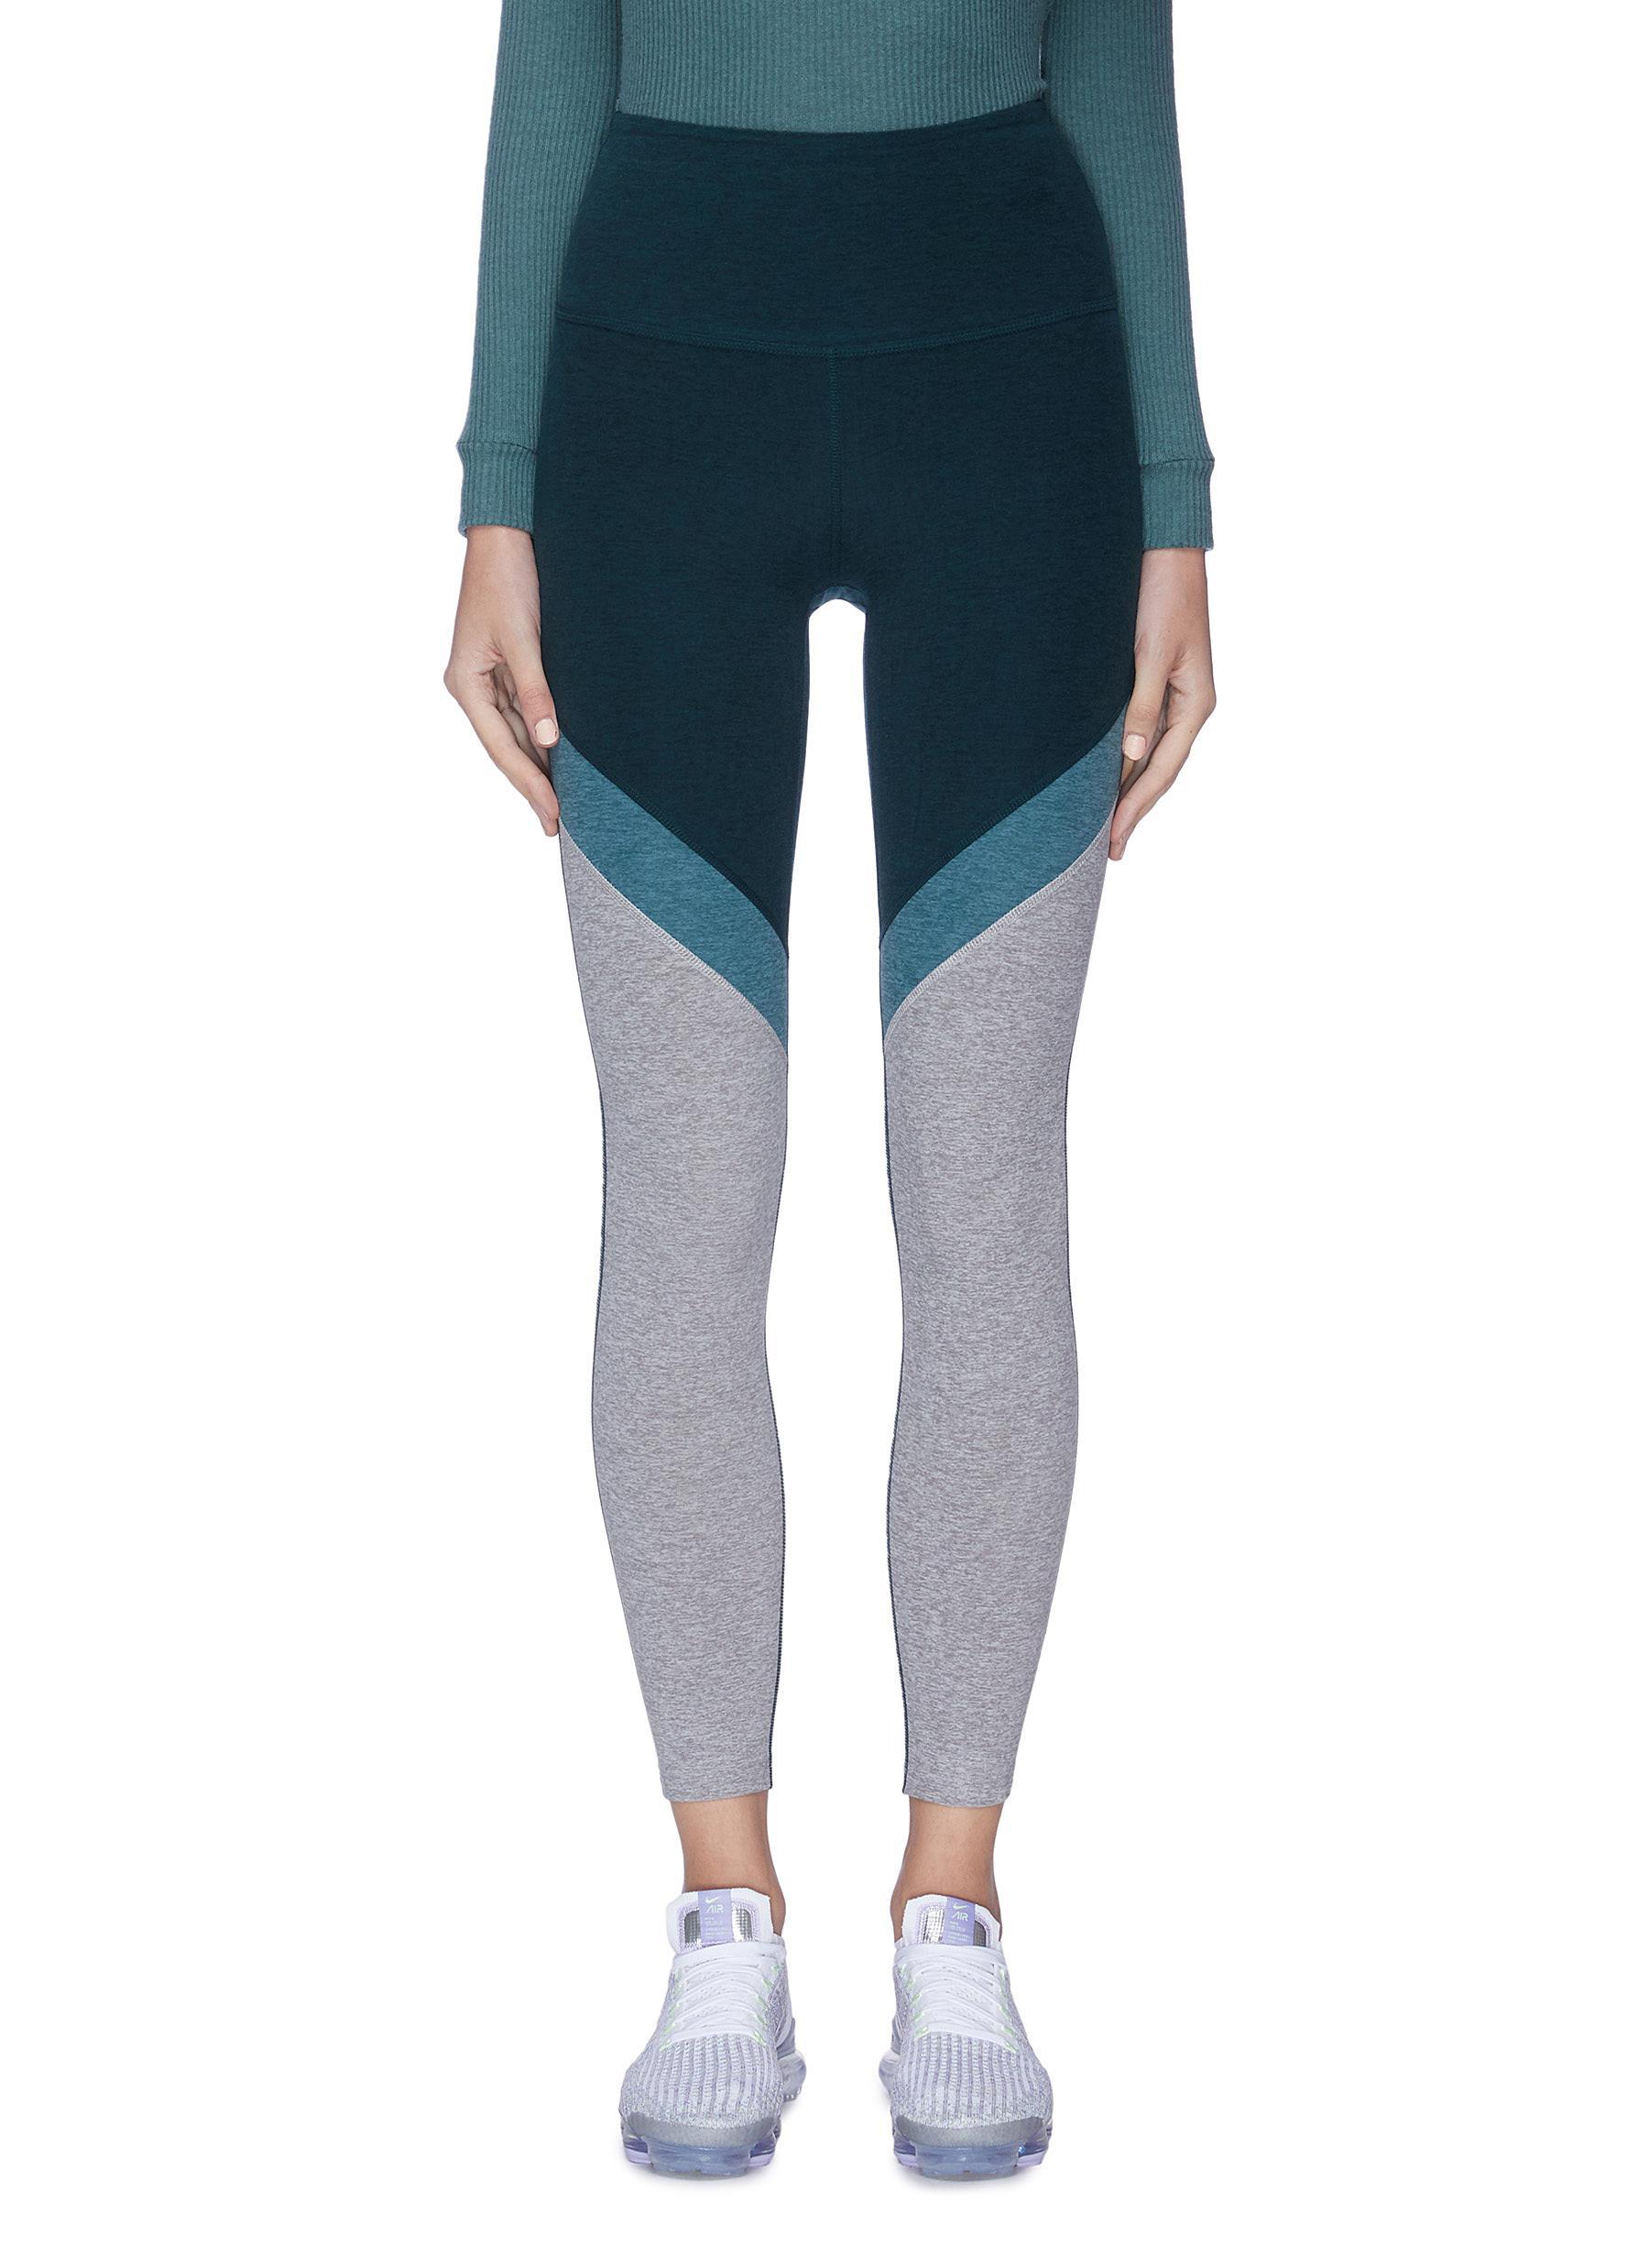 shop Beyond Yoga Tri-panel' space dye high waisted midi leggings online